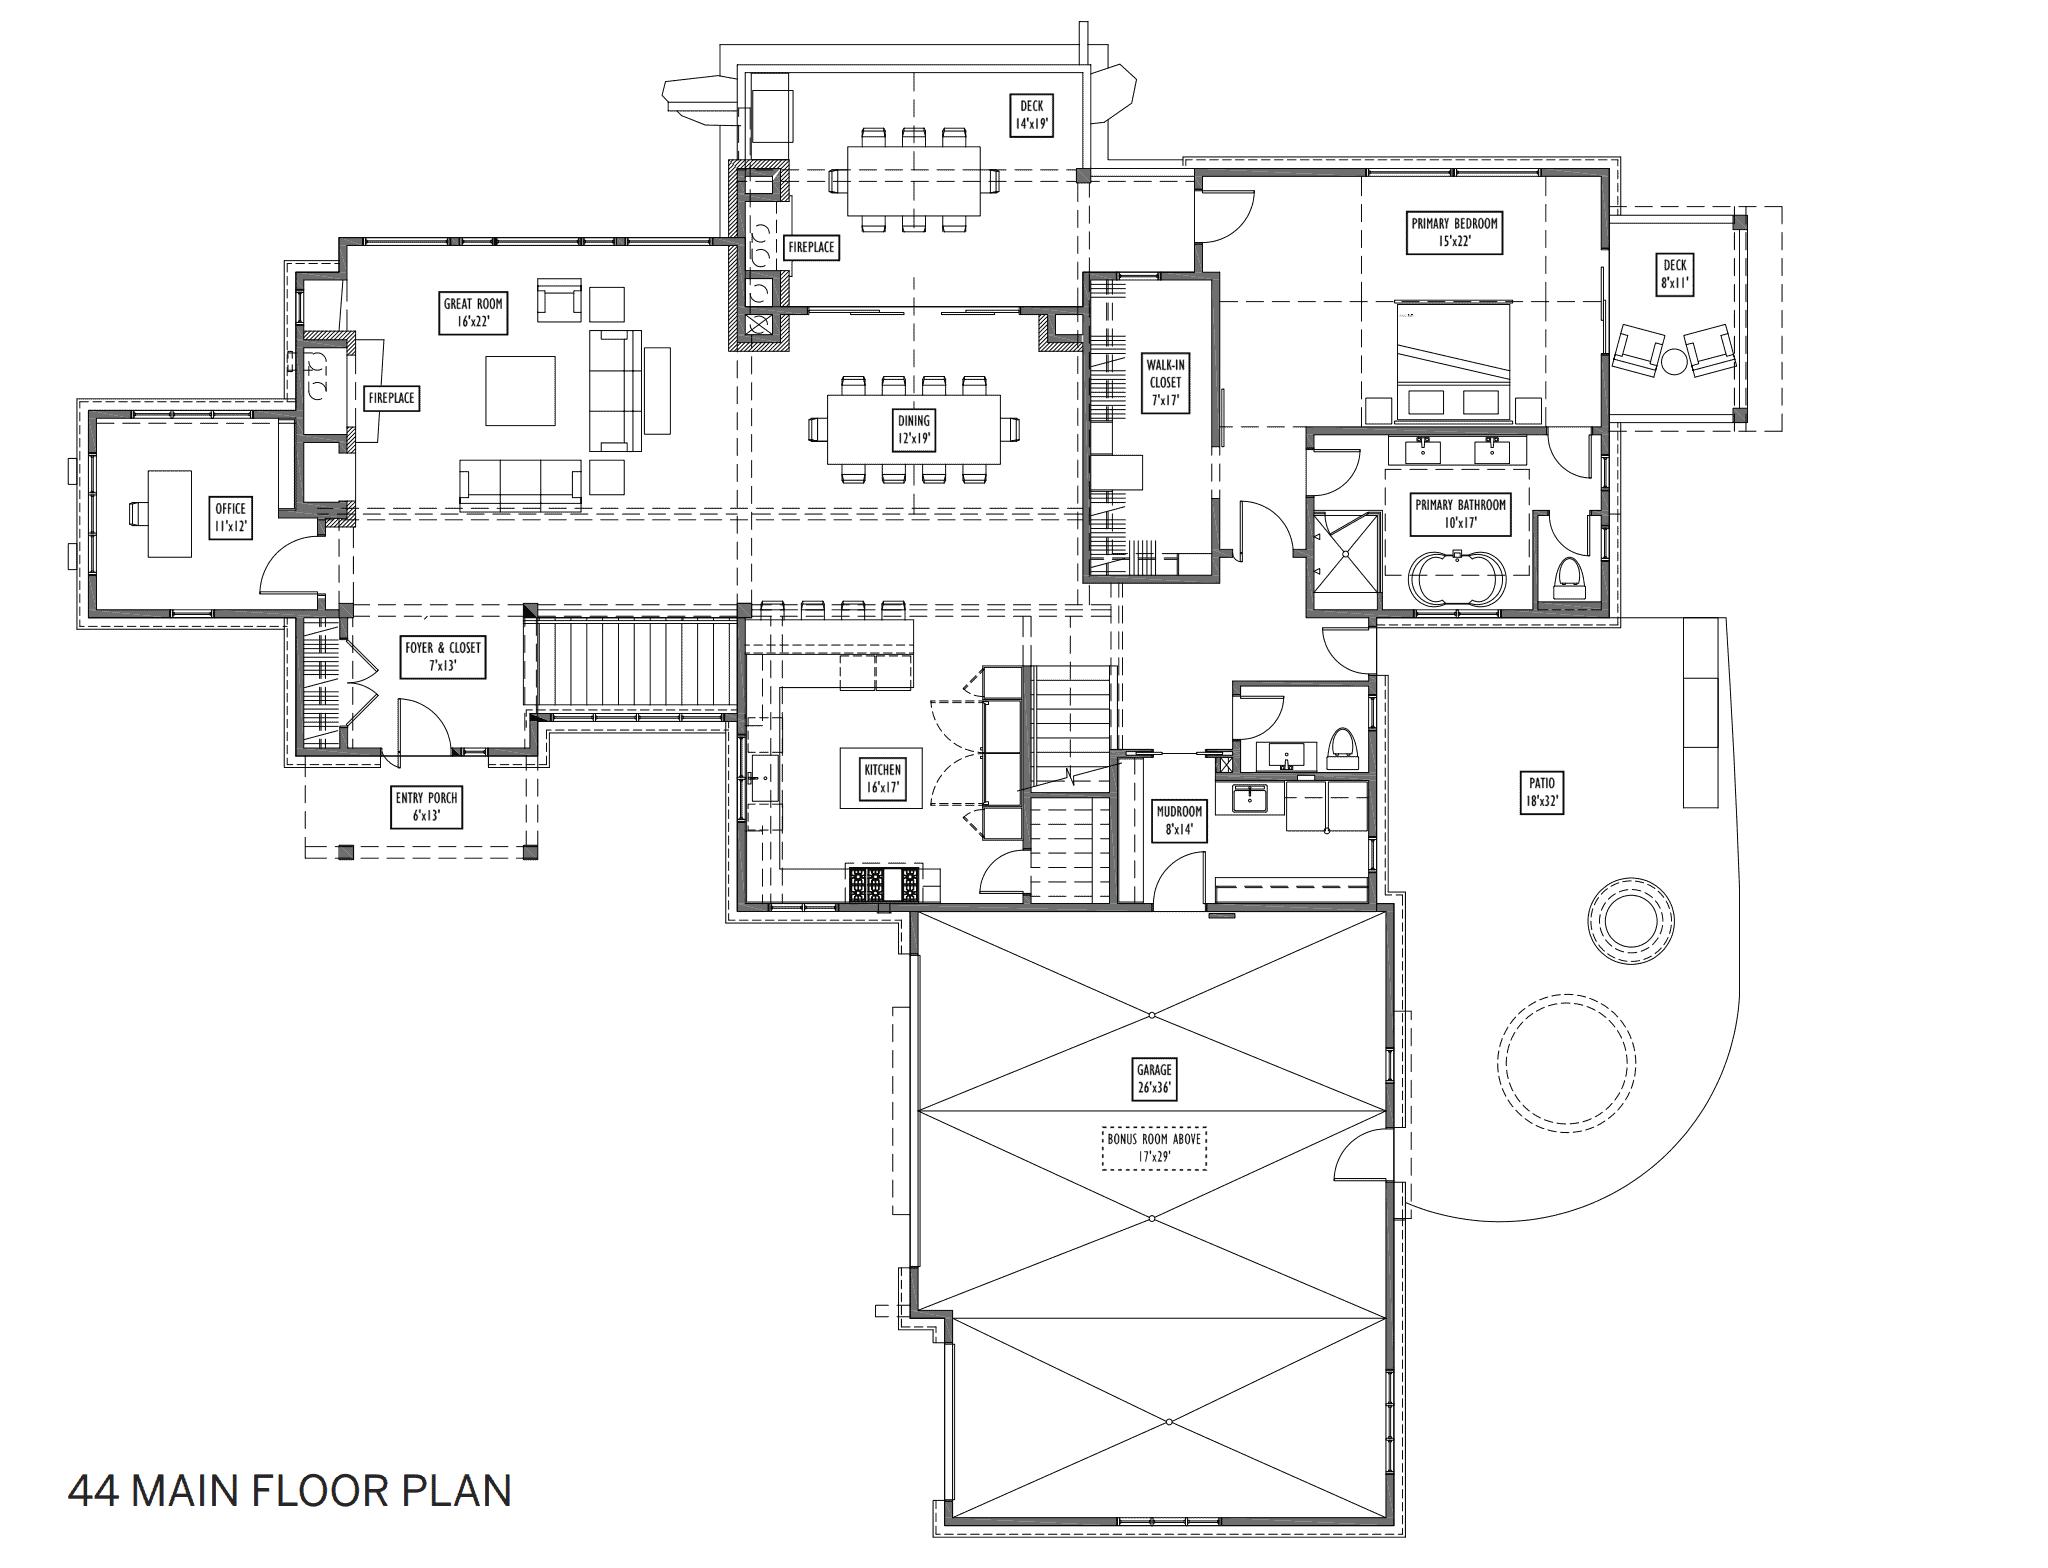 lot 44 floor plan 1 - Alpine Mountain Ranch & Club Broker Toolkit